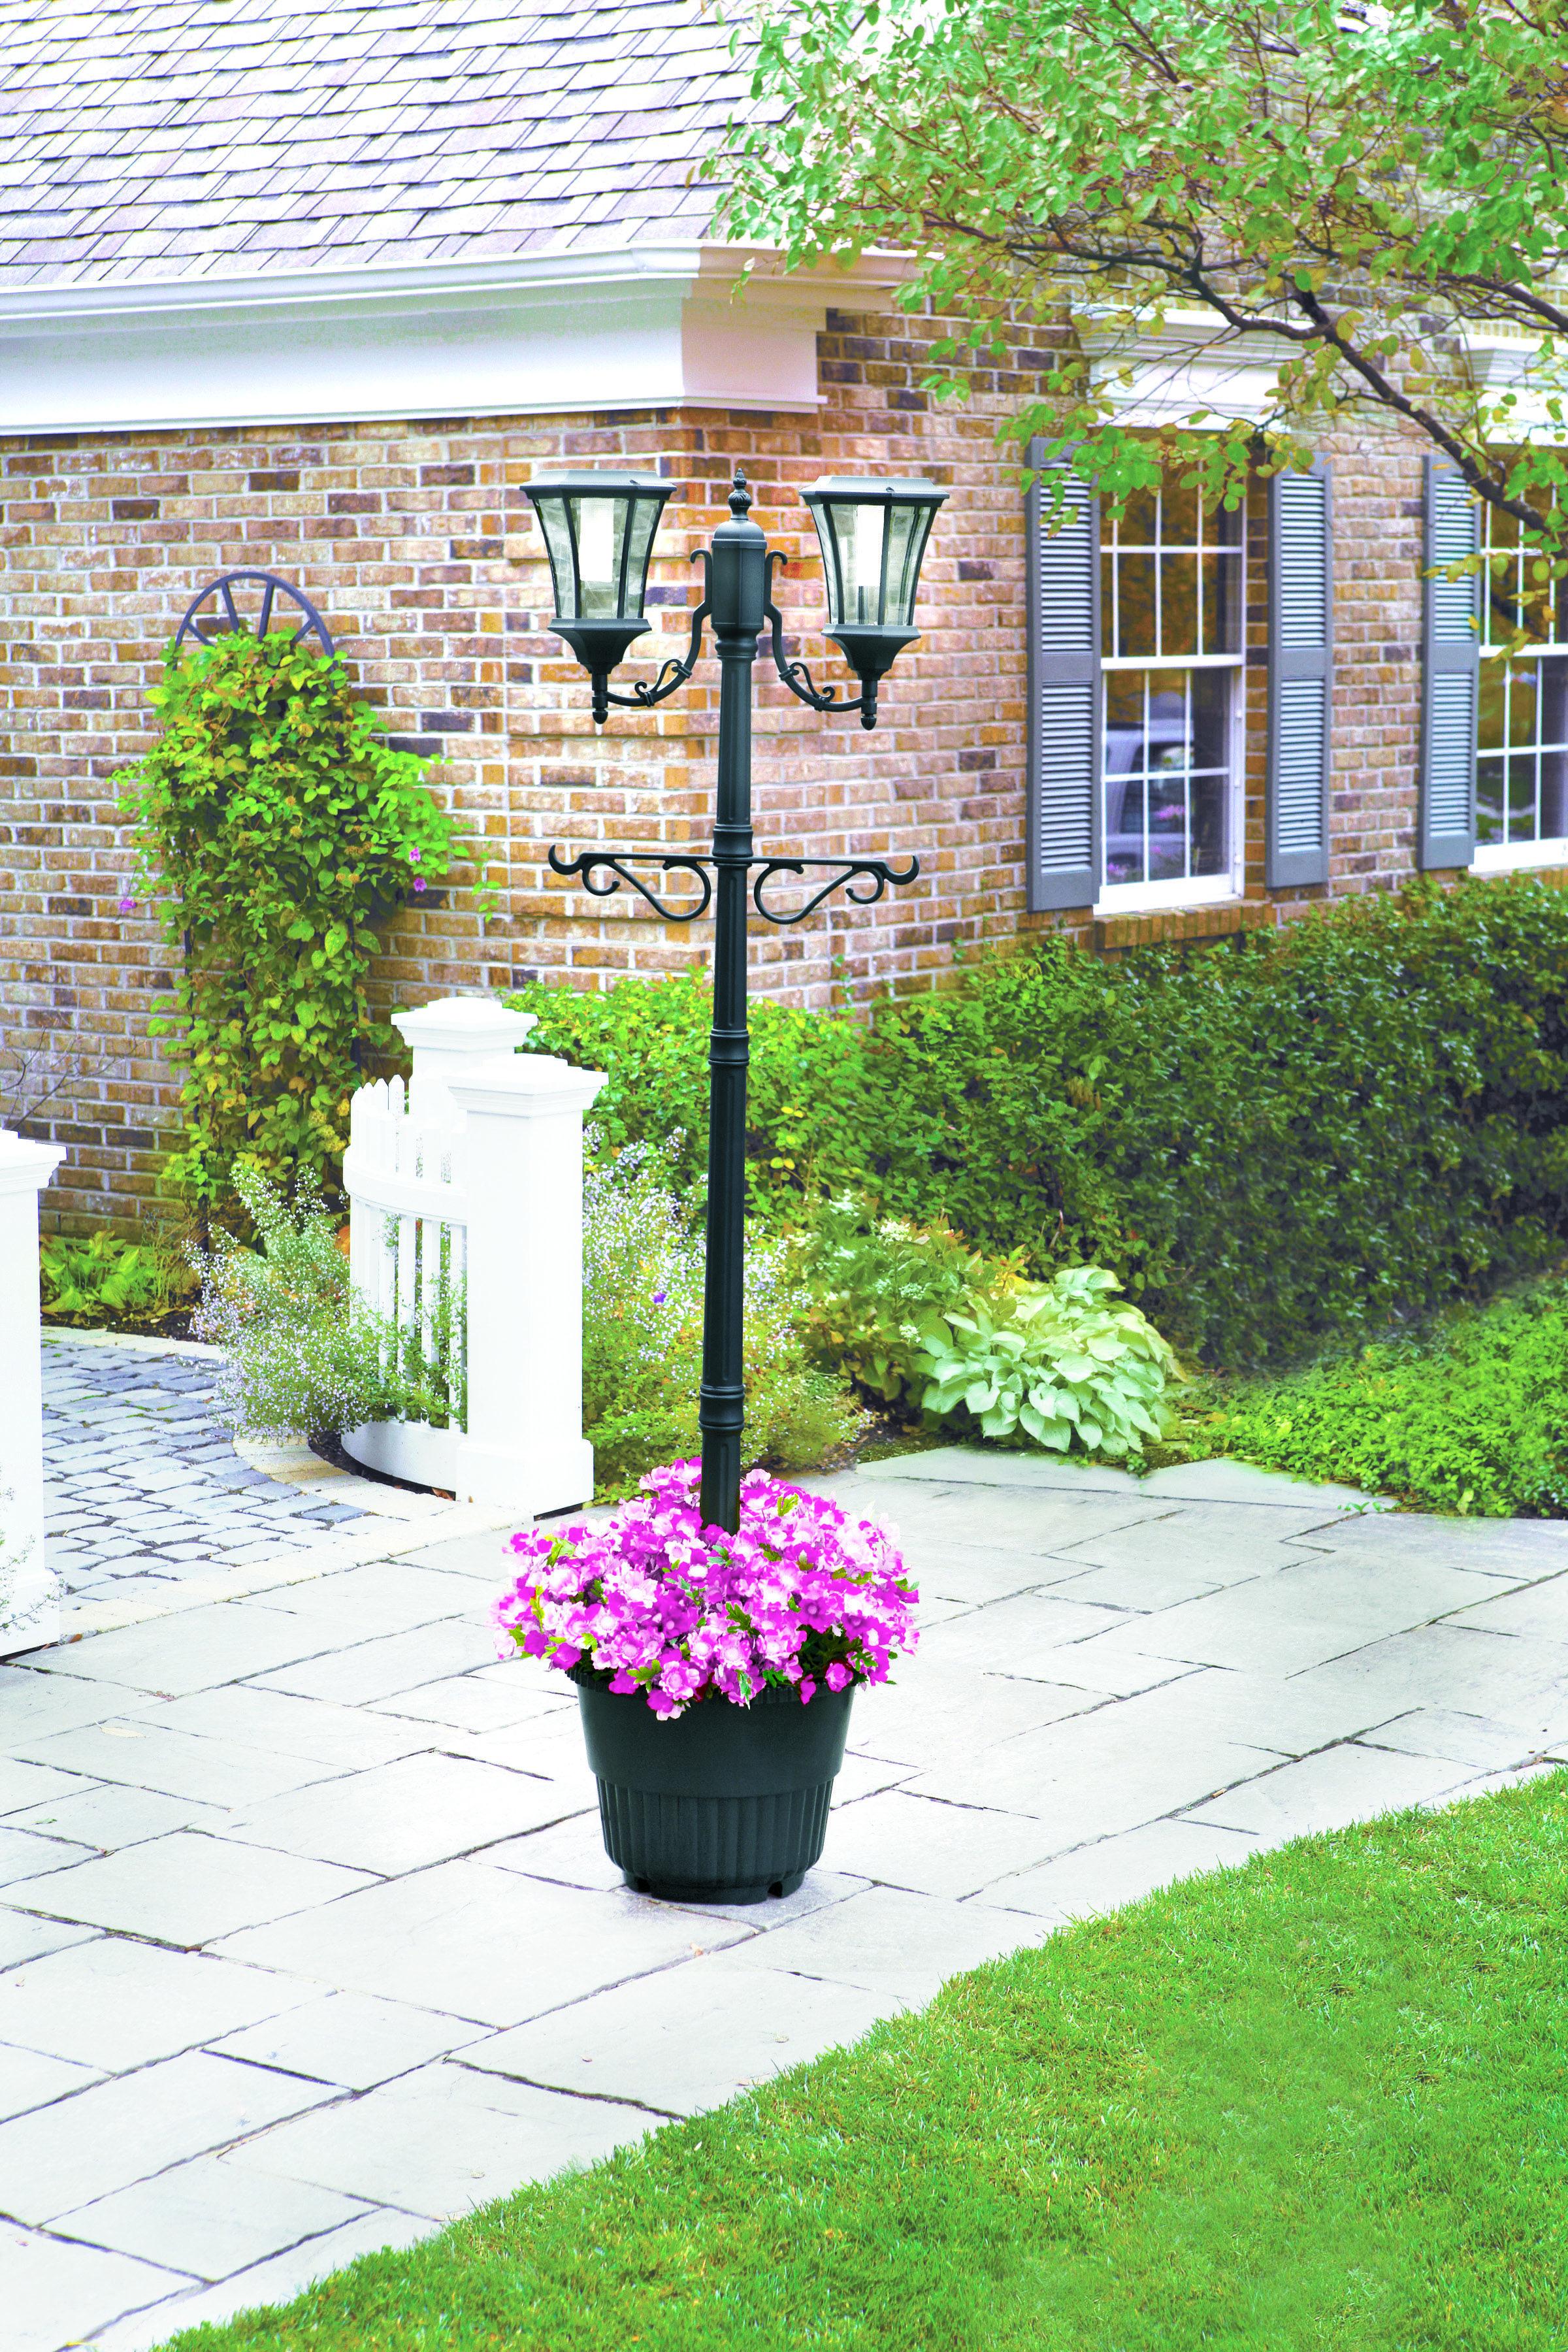 cfm baytown solar lamp sonic gama post baytownsolarlamppostwithplanter planter with product hayneedle master